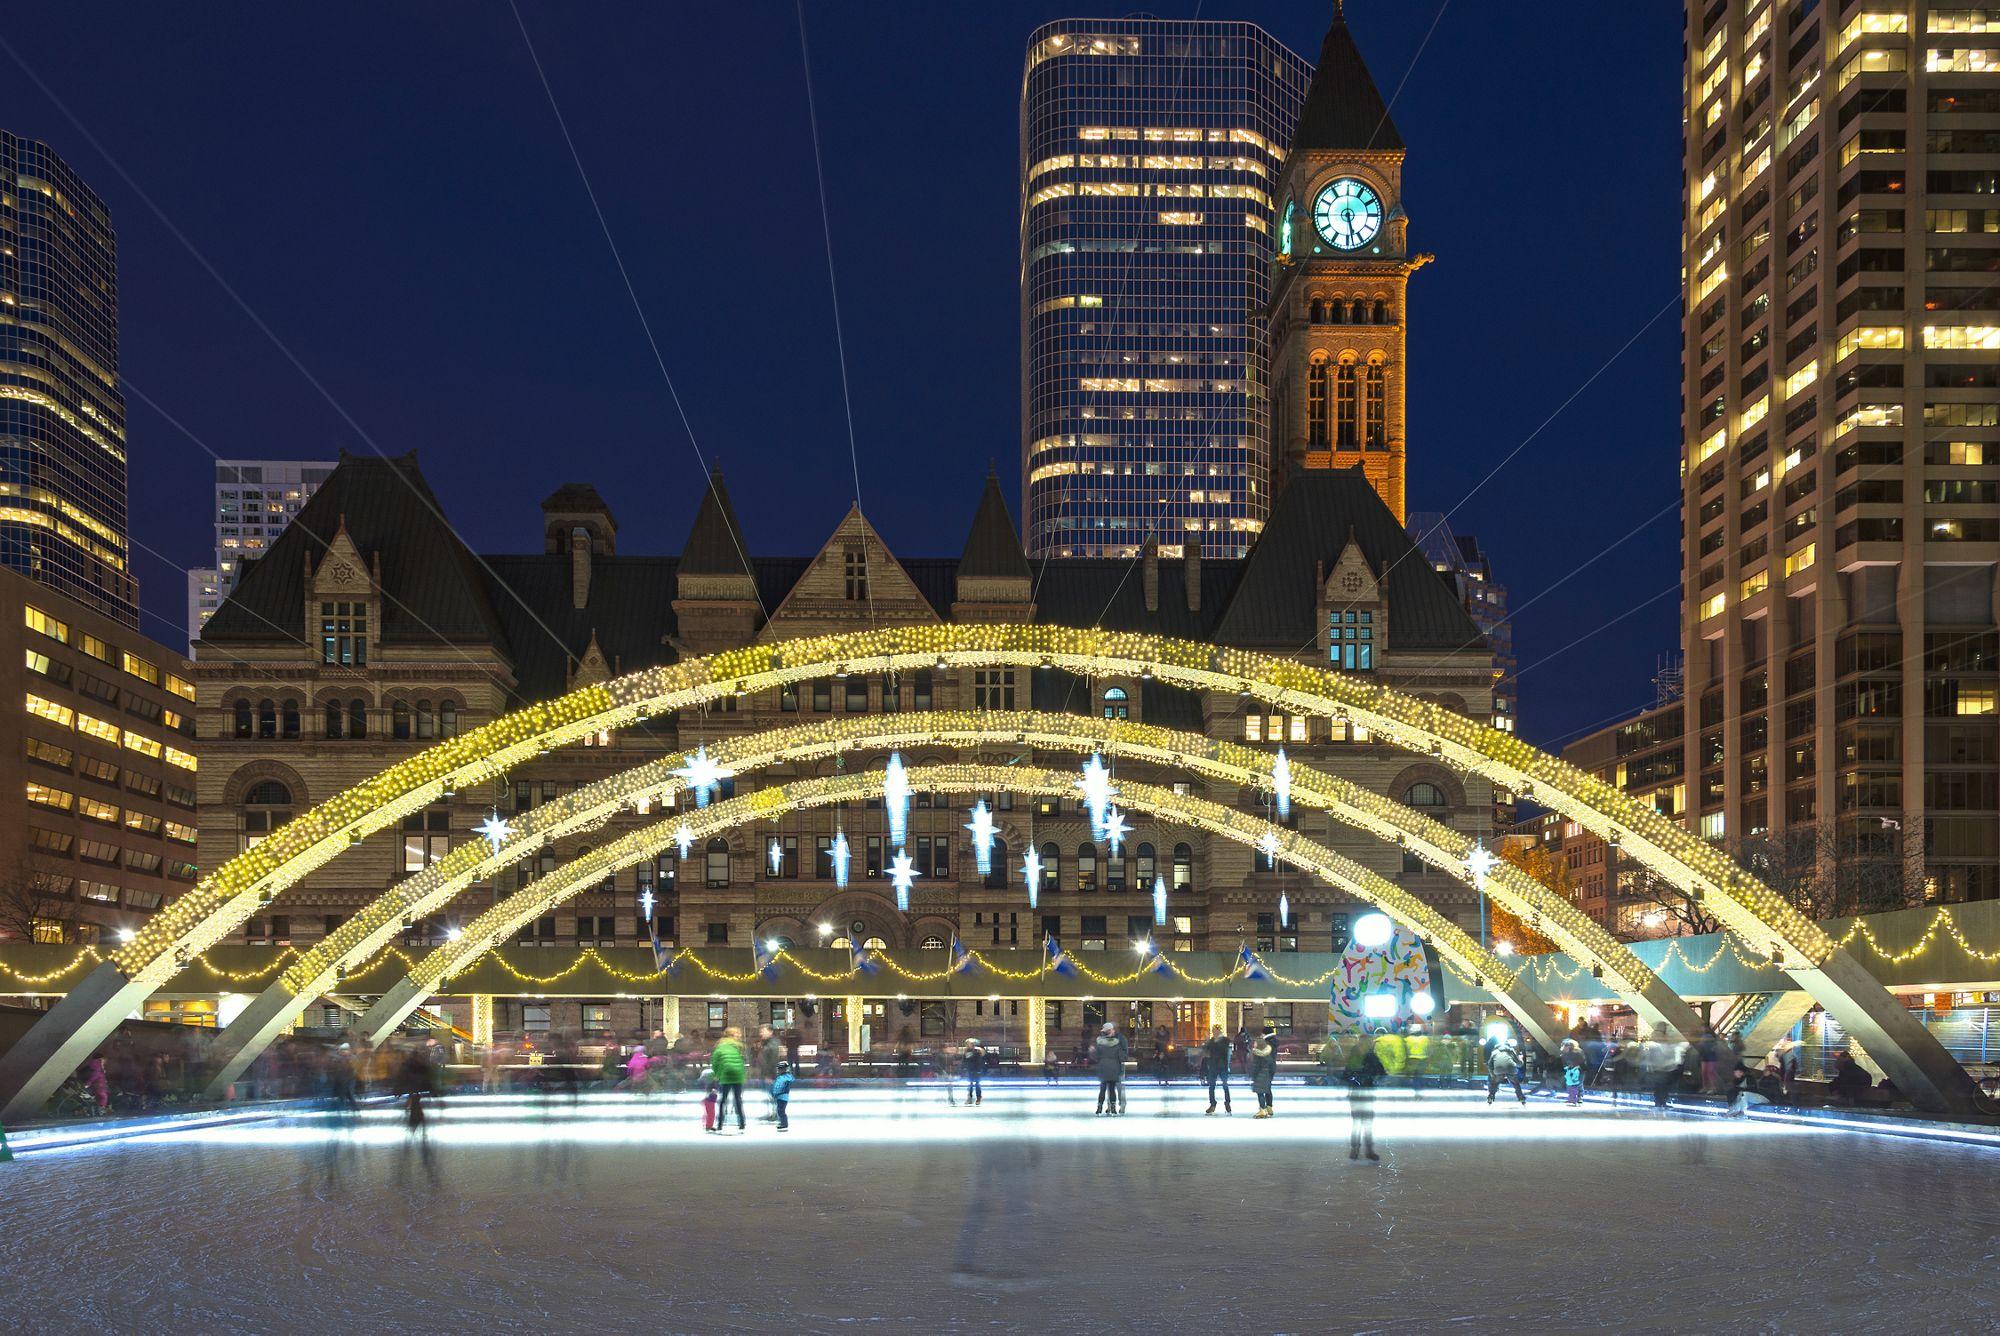 Christmas Events Toronto In November 2021